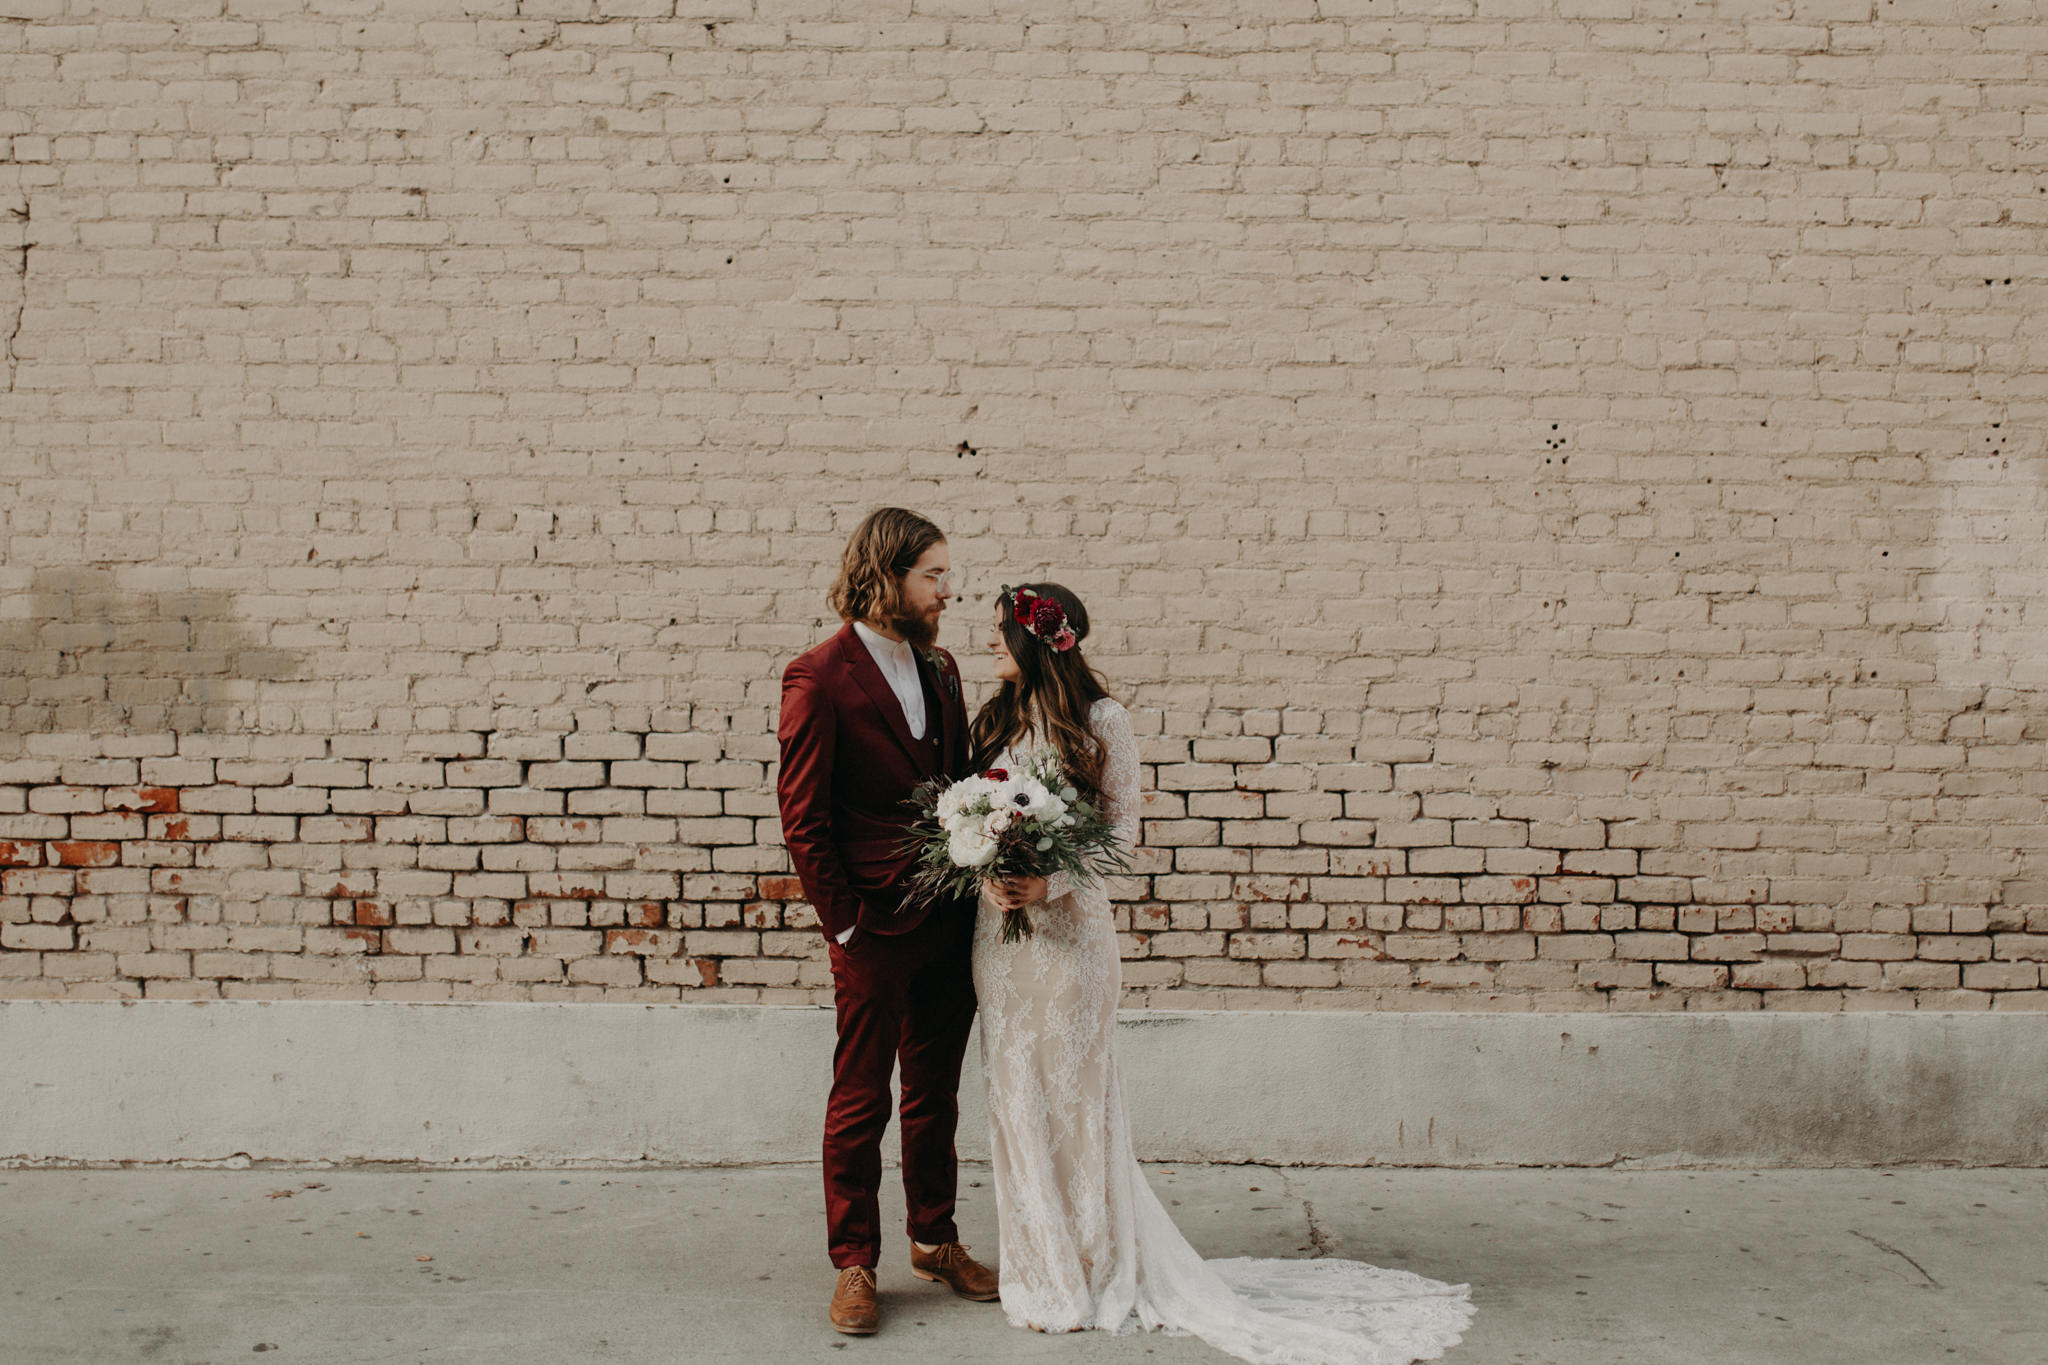 couple-wedding-indie-wedding-northern-california-49.jpg